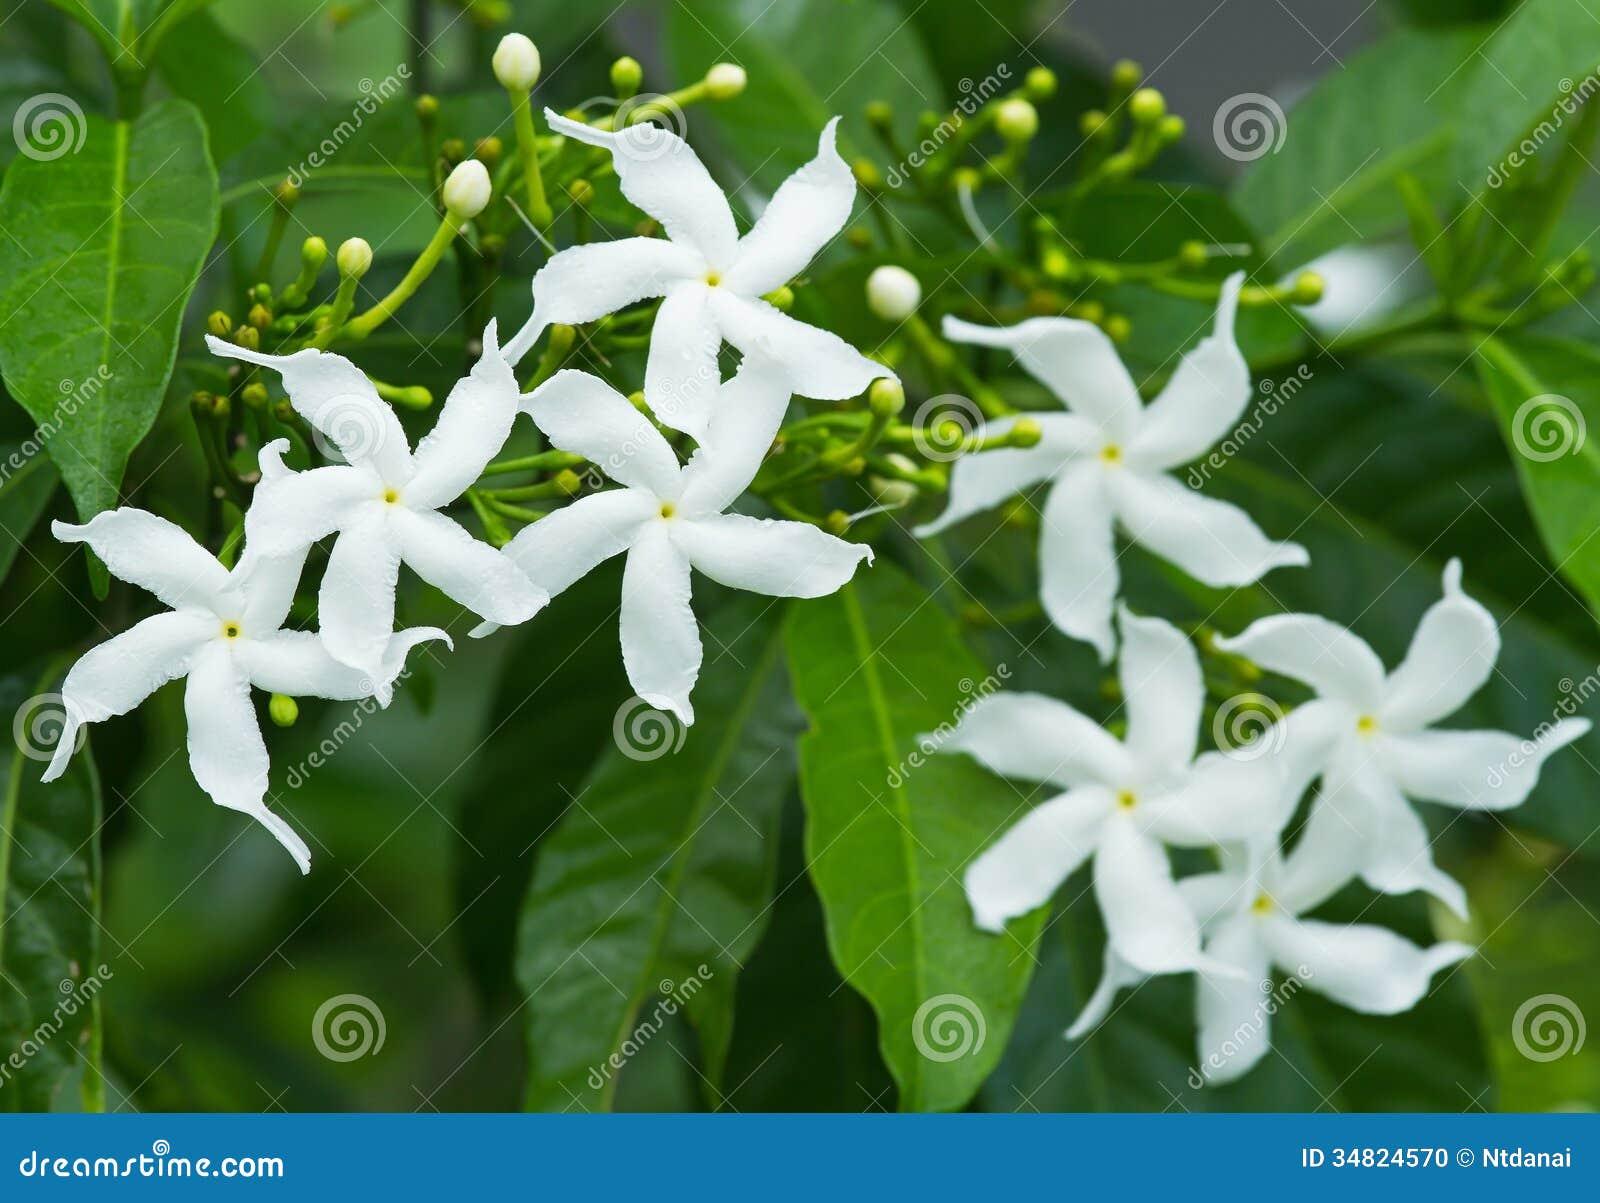 Sampaguita Jasmine Stock Photo Image Of Flower Growth 34824570